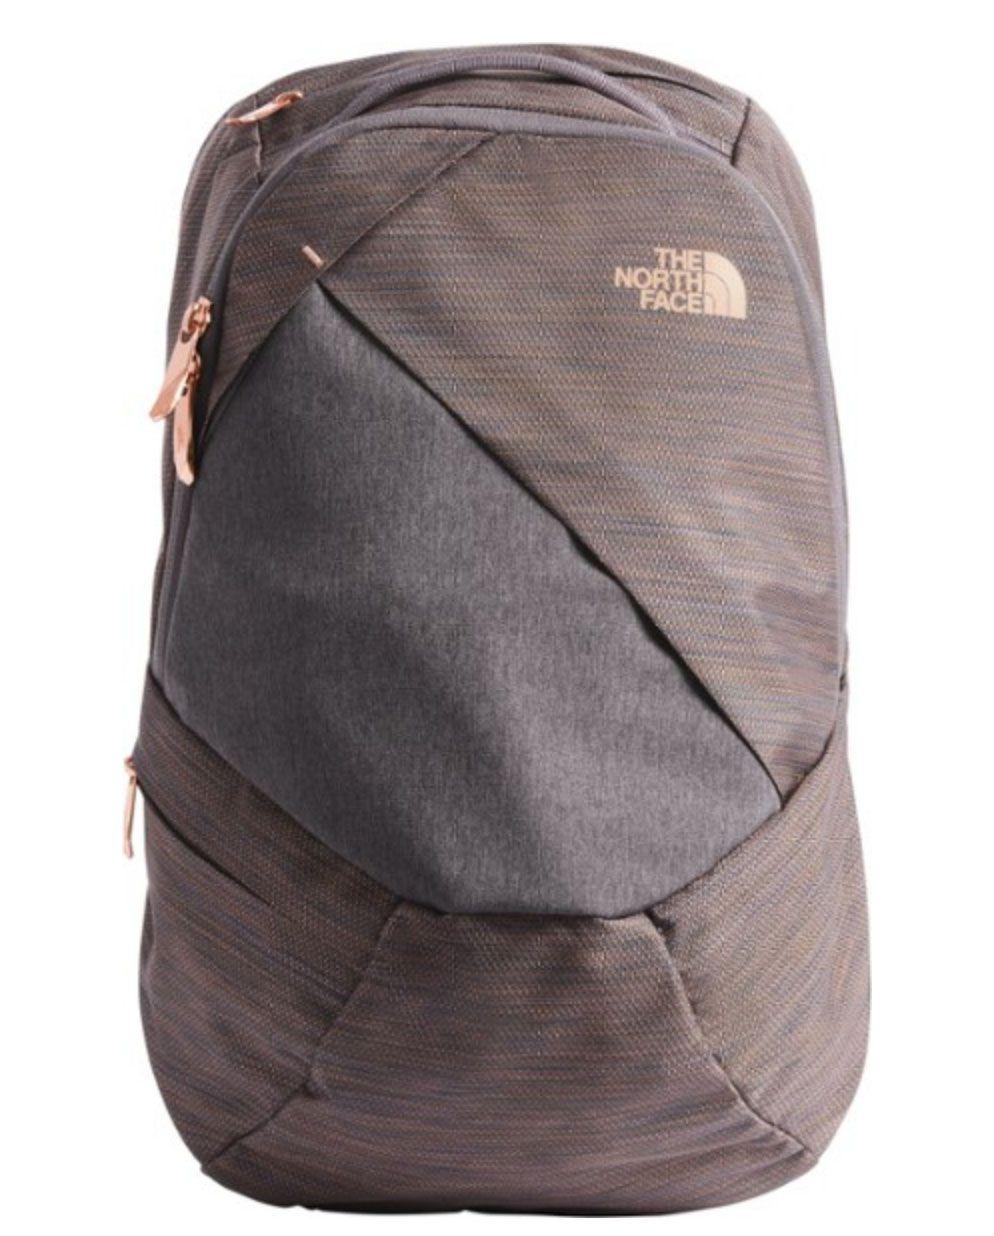 7fa6f2f49fa5 Backpacks for Running